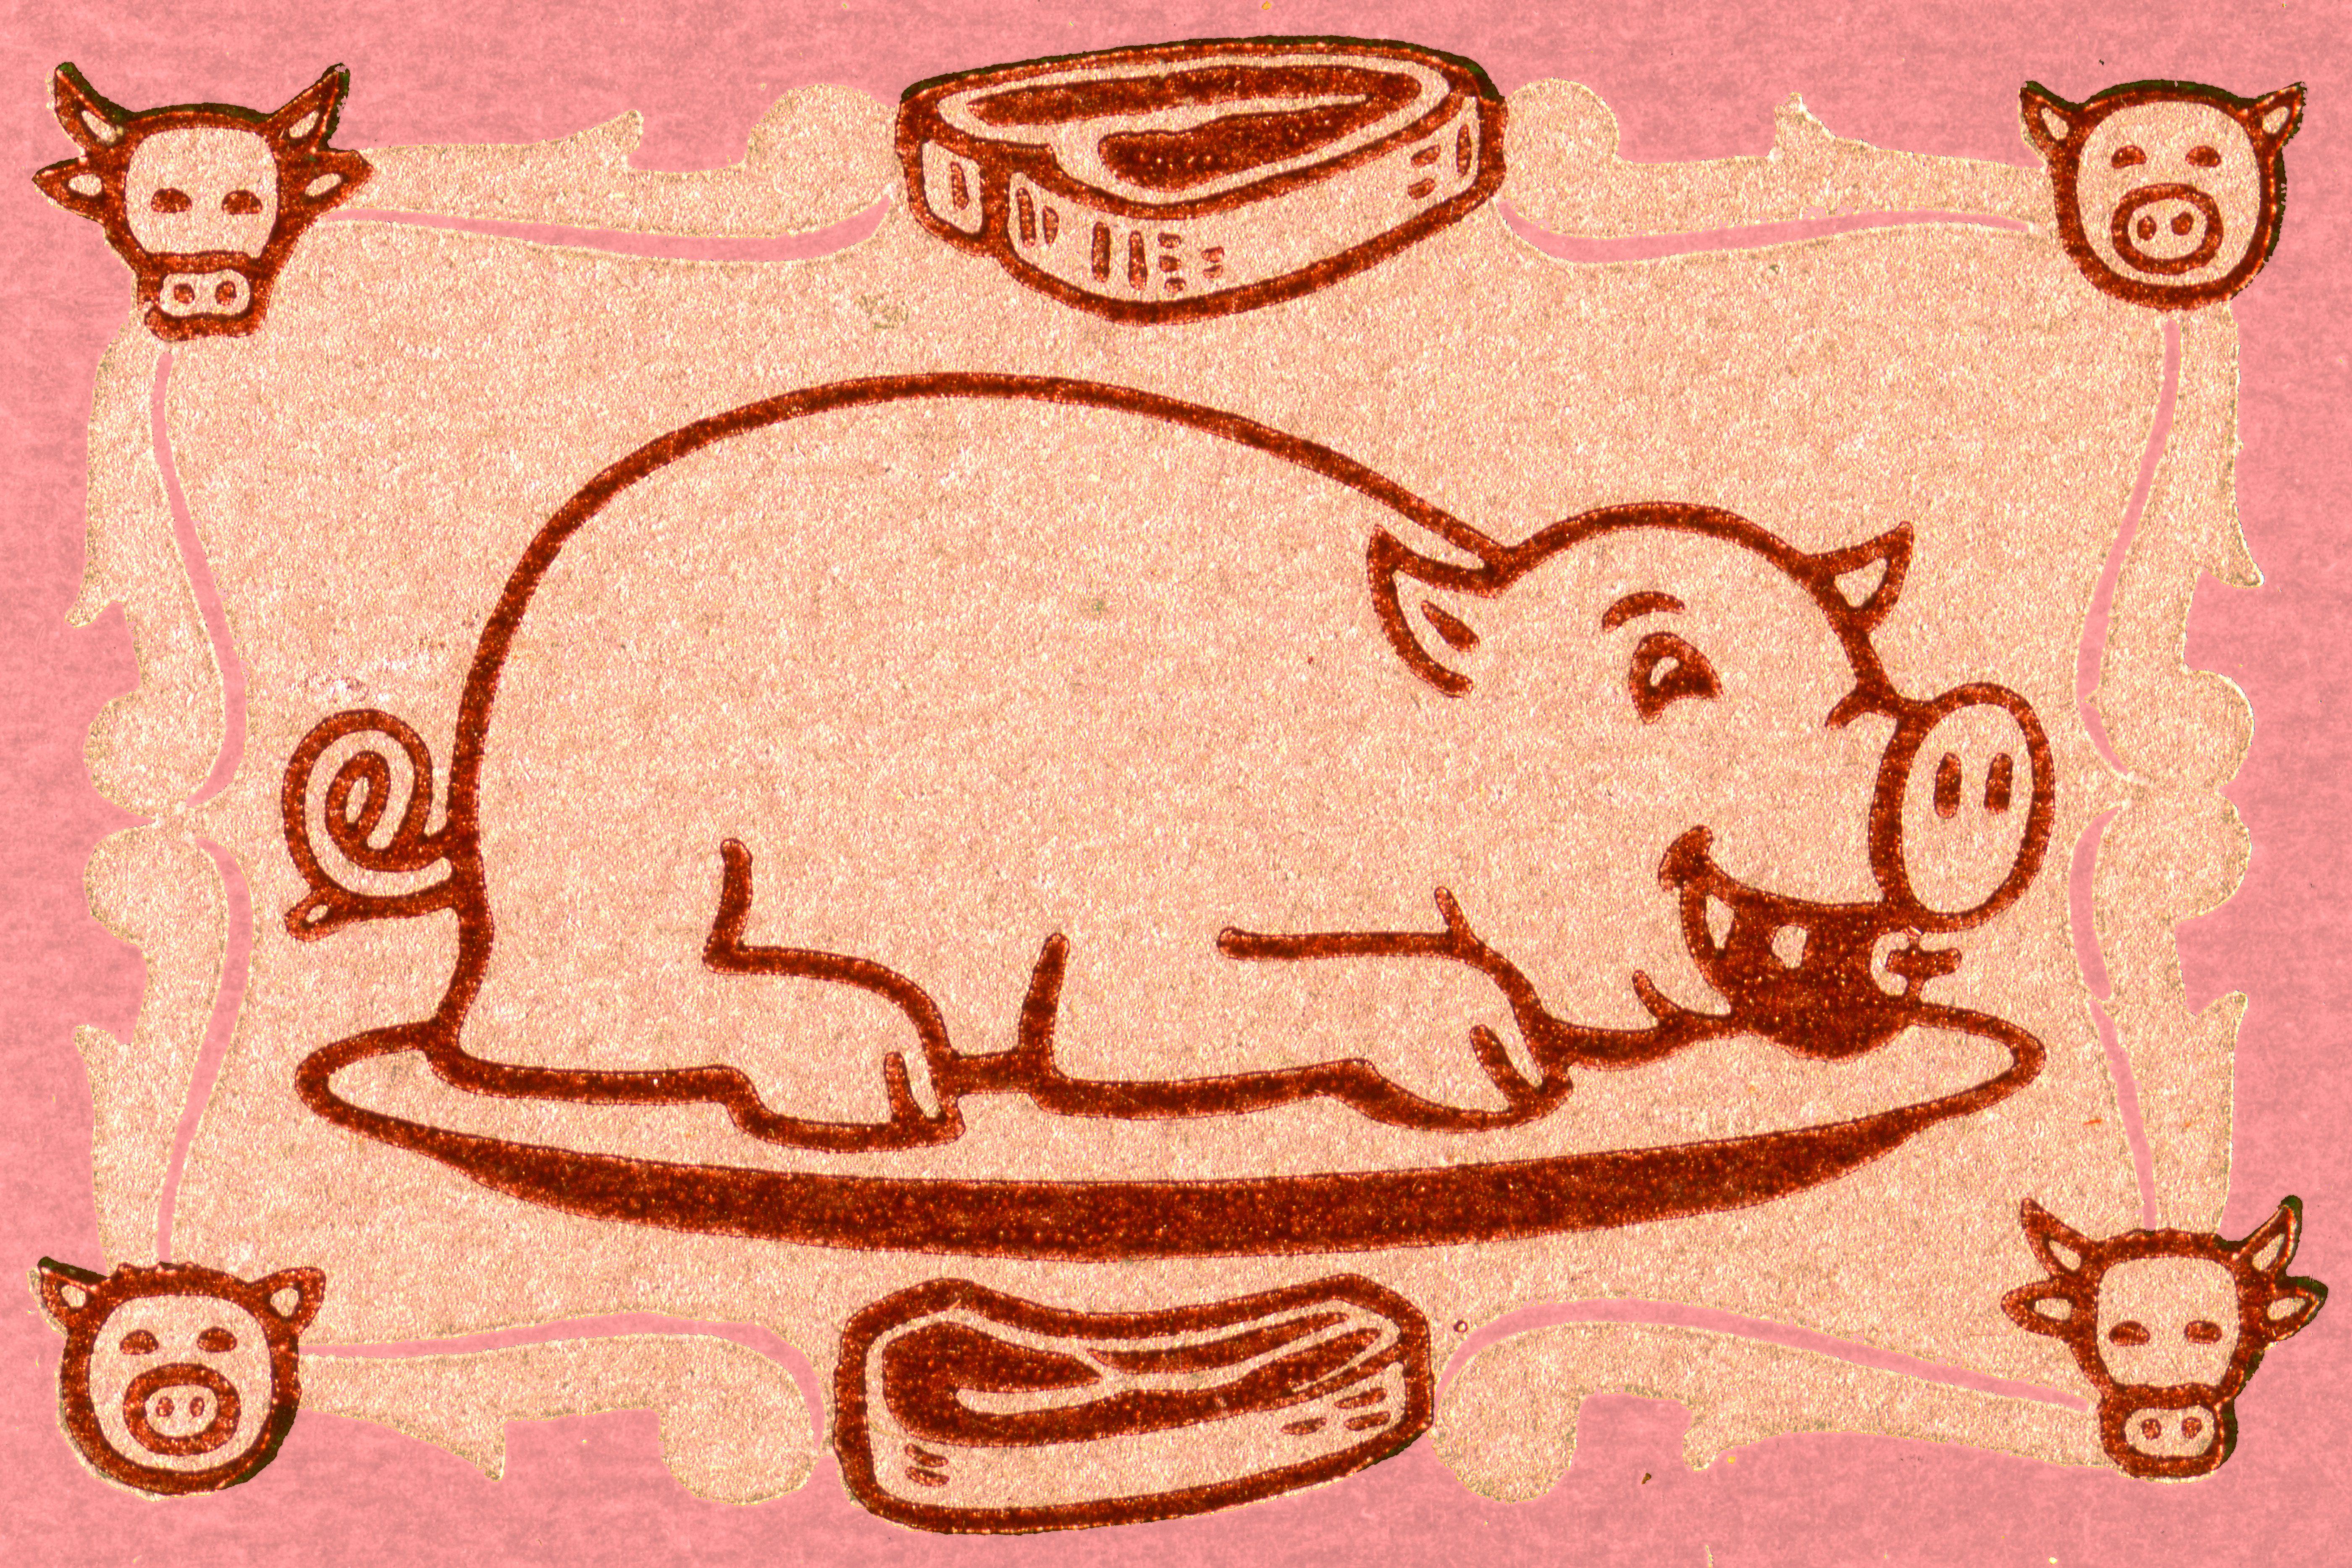 Pig on platter